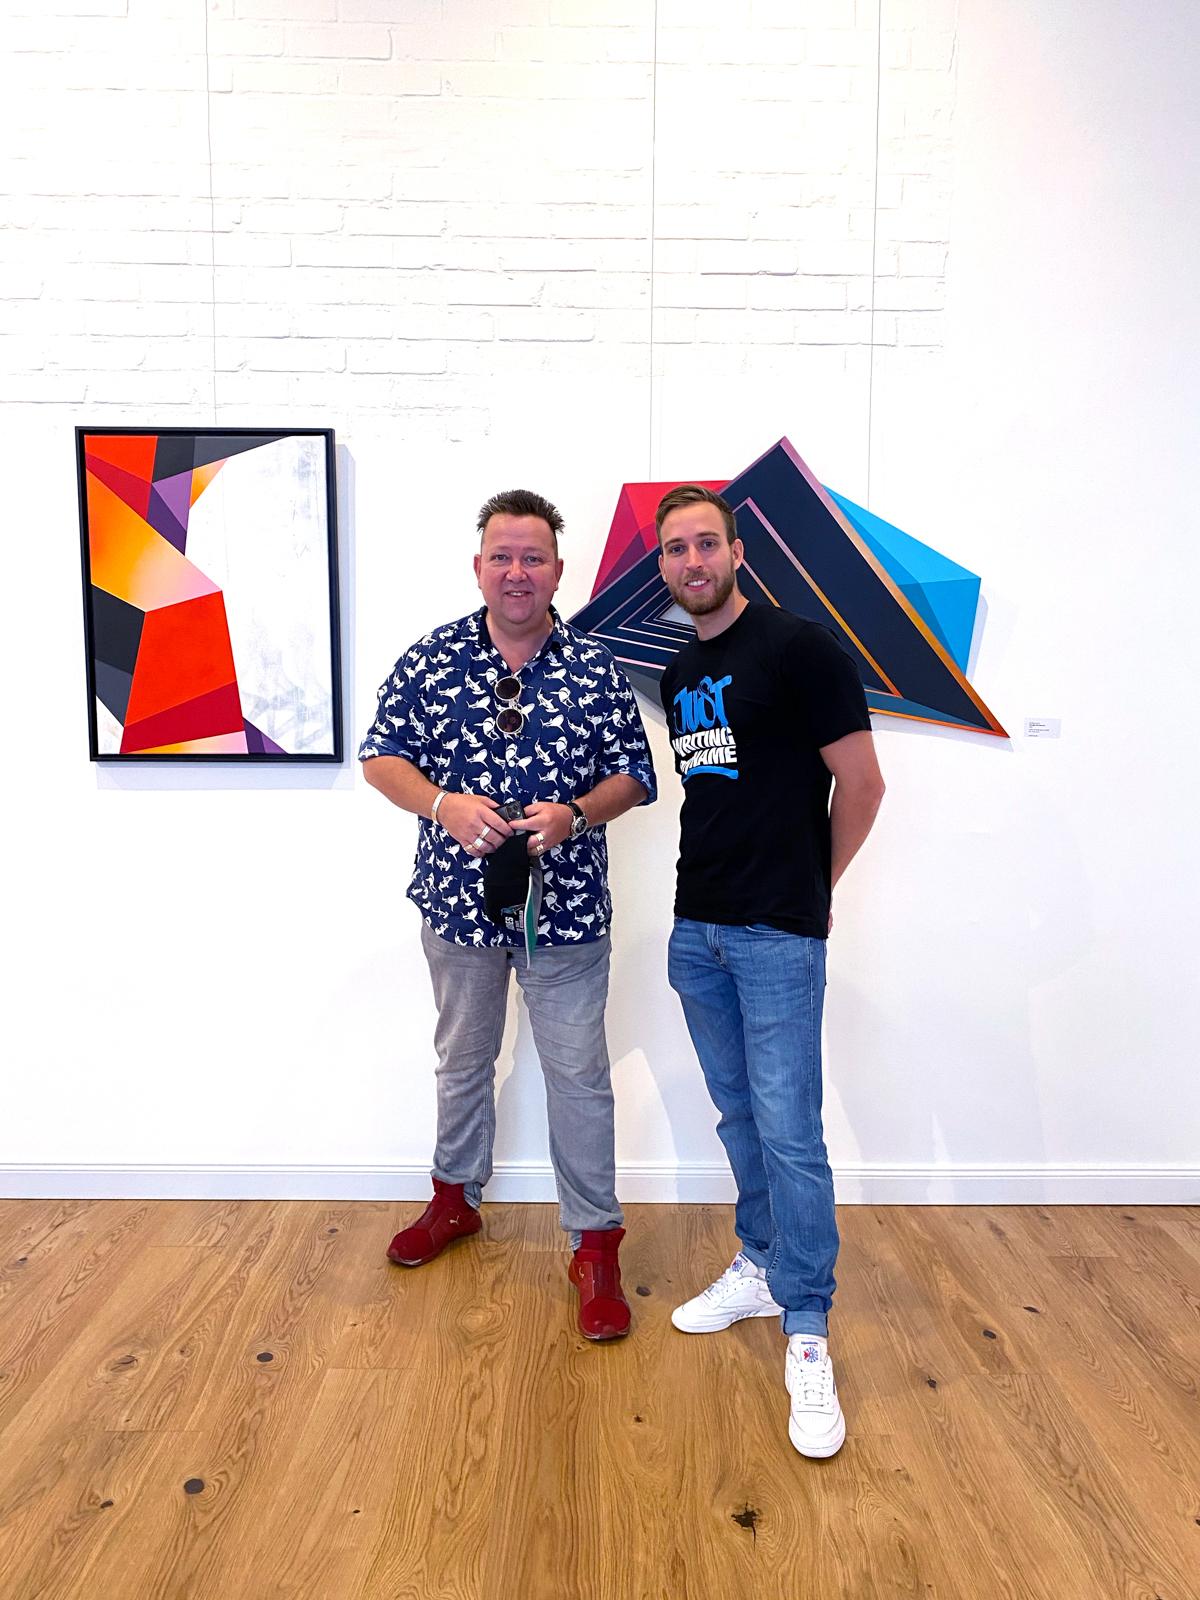 Sebastian Krumbiegel and Kai Raws Imhof